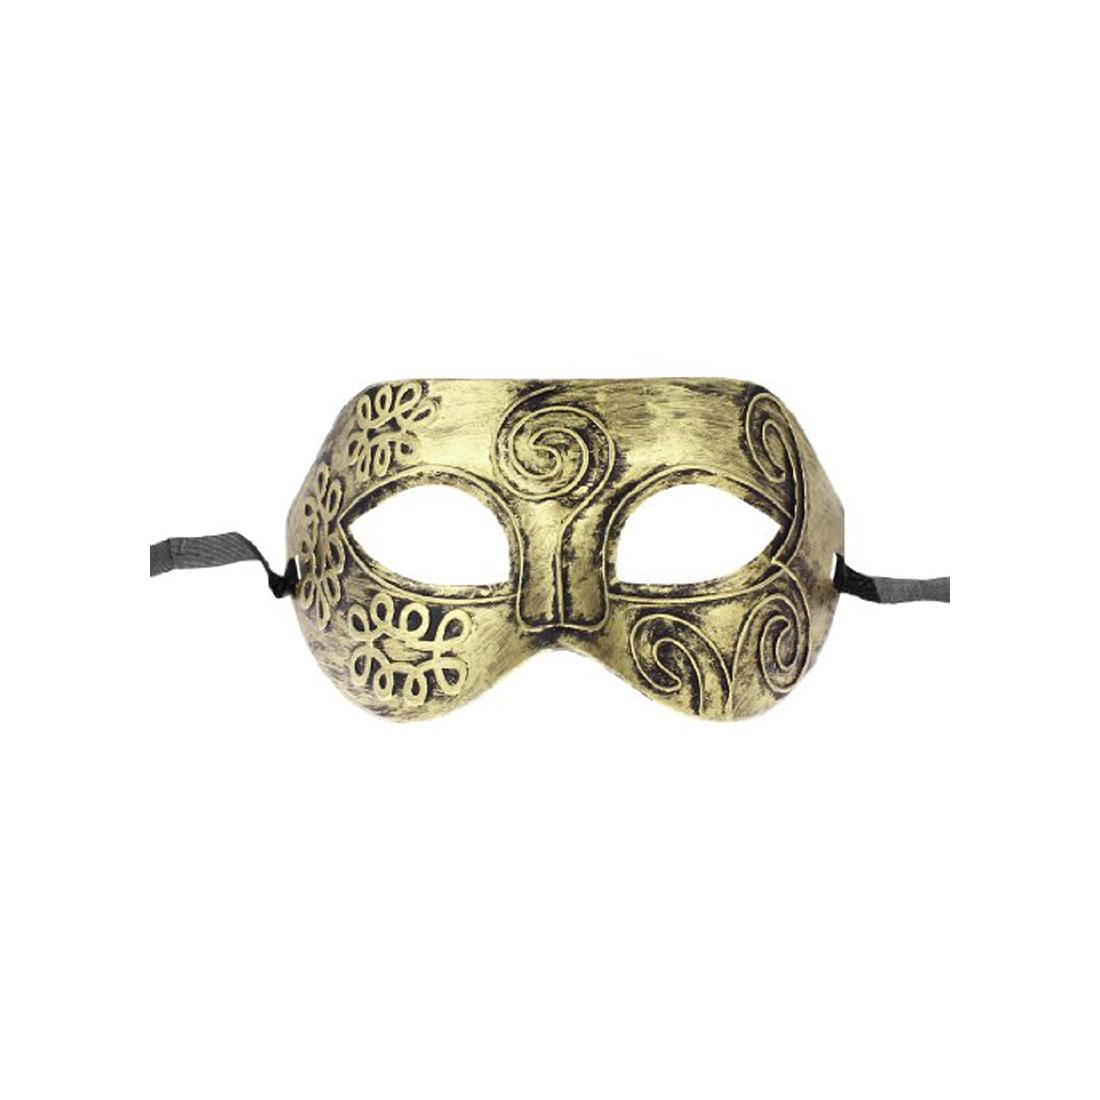 PHFU wholesale 5PCS Wholesale Gold Tone Roman Greek Mens Venetian Halloween Costume Party Masquerade Mask(China (Mainland))